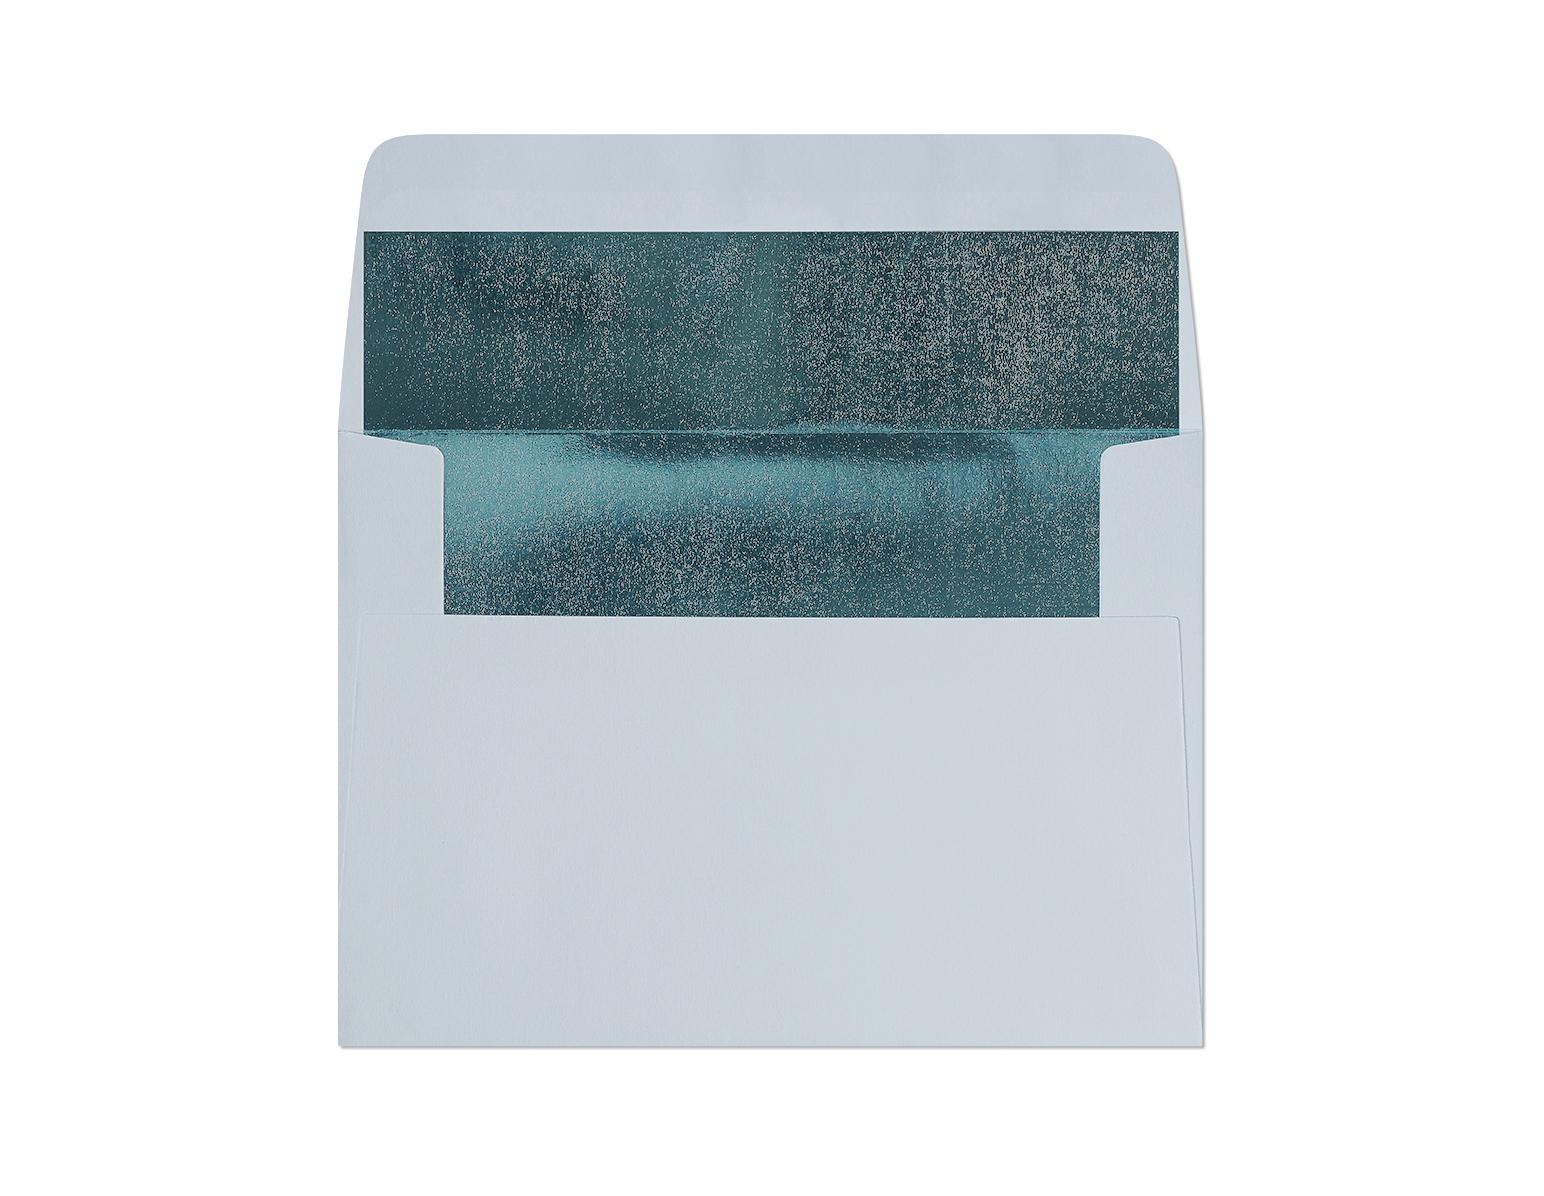 Galeria Papieru obálky C6 s metalickým vnitřkem modrá 120g, 10ks